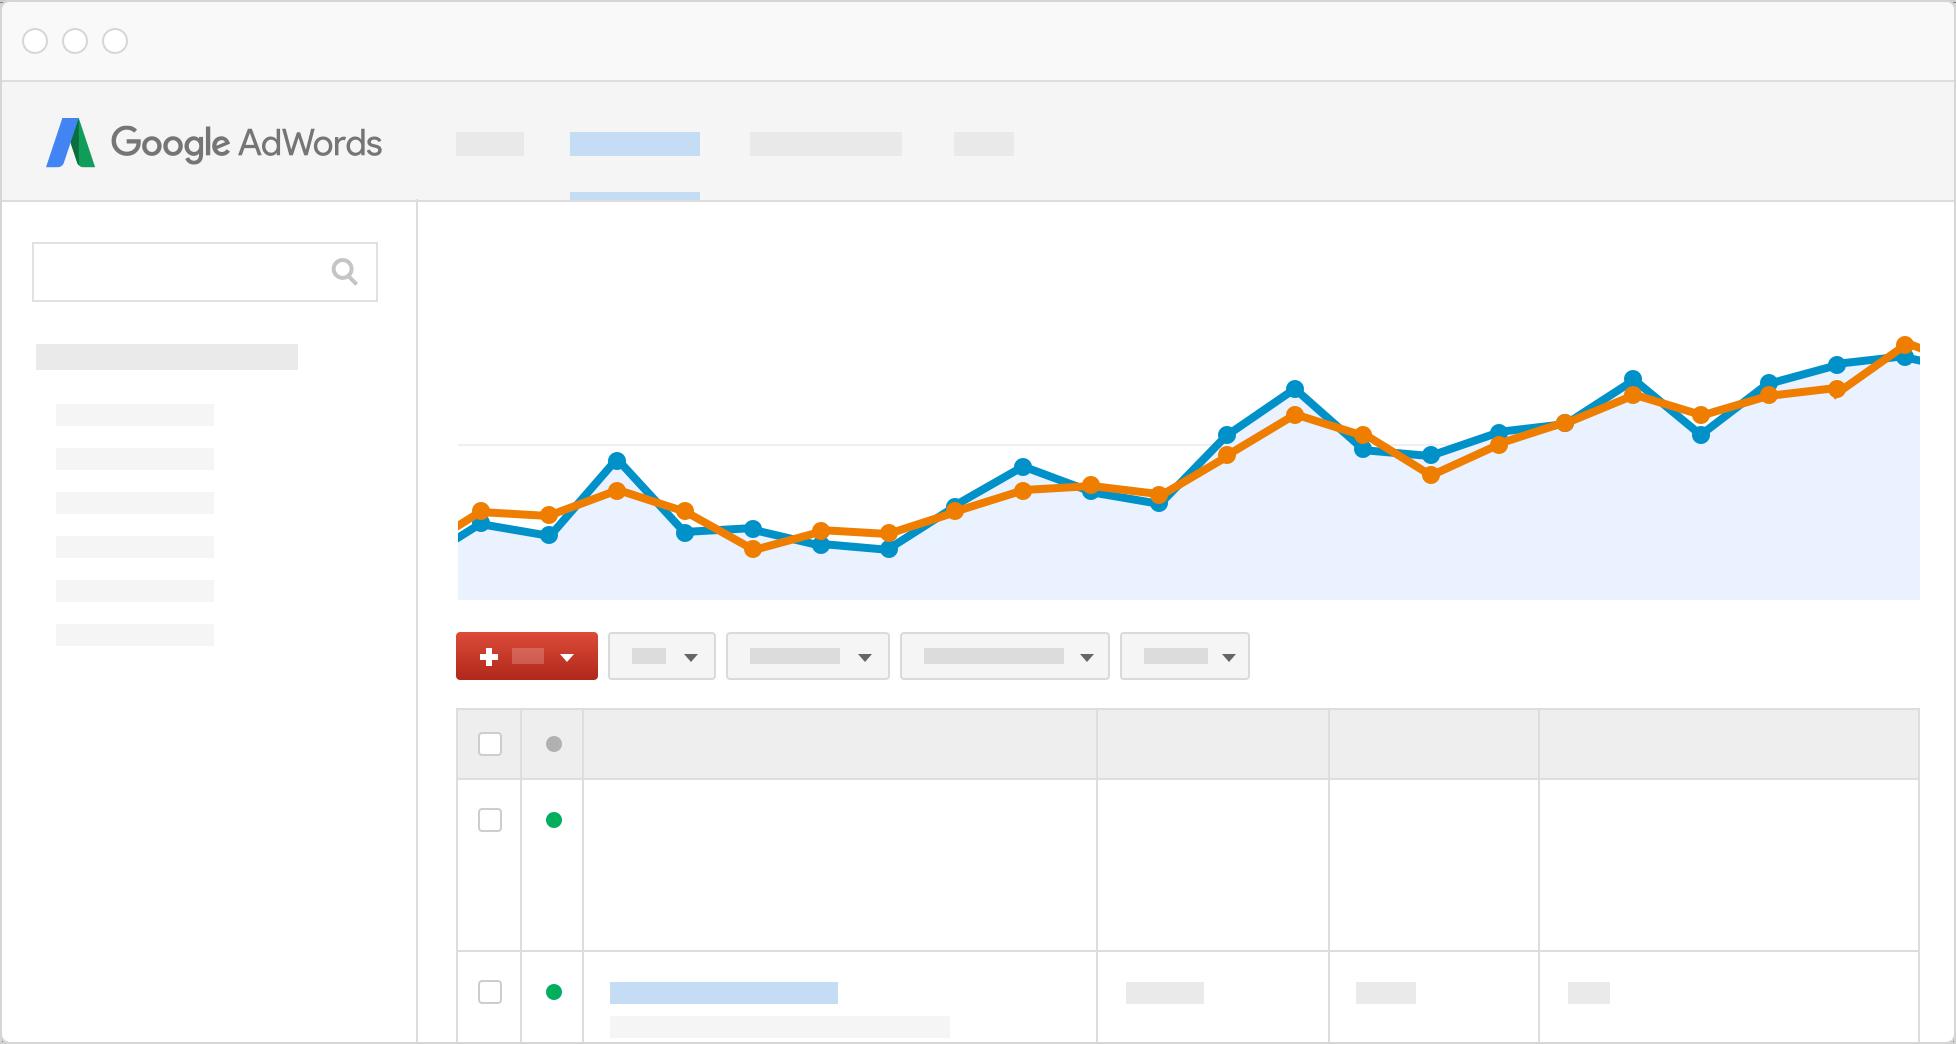 Google Ads user interface